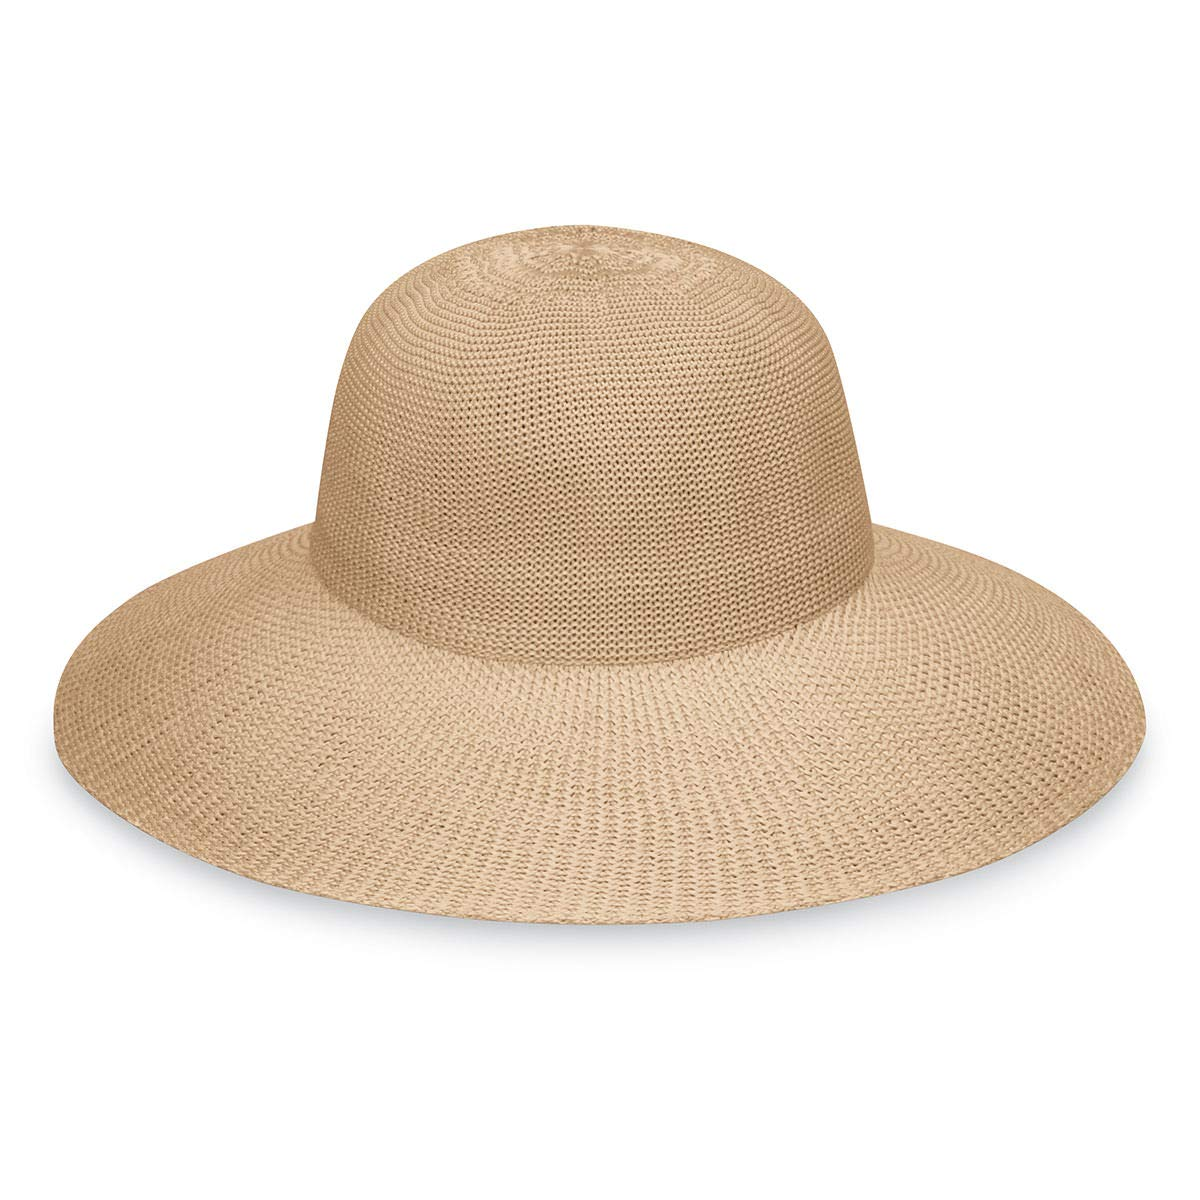 Wallaroo Hat Company Women's Victoria Diva Sun Hat- Packable Straw Hat, Tan